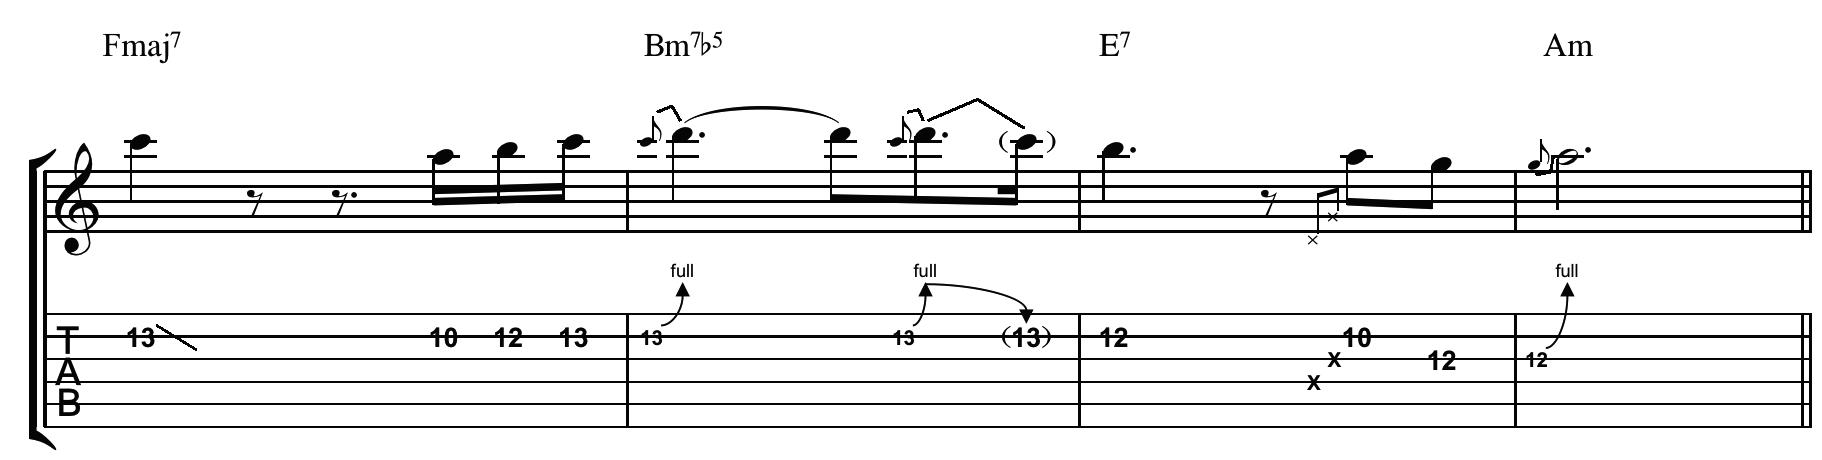 still-got-the-blues-guitar-tab_2.png